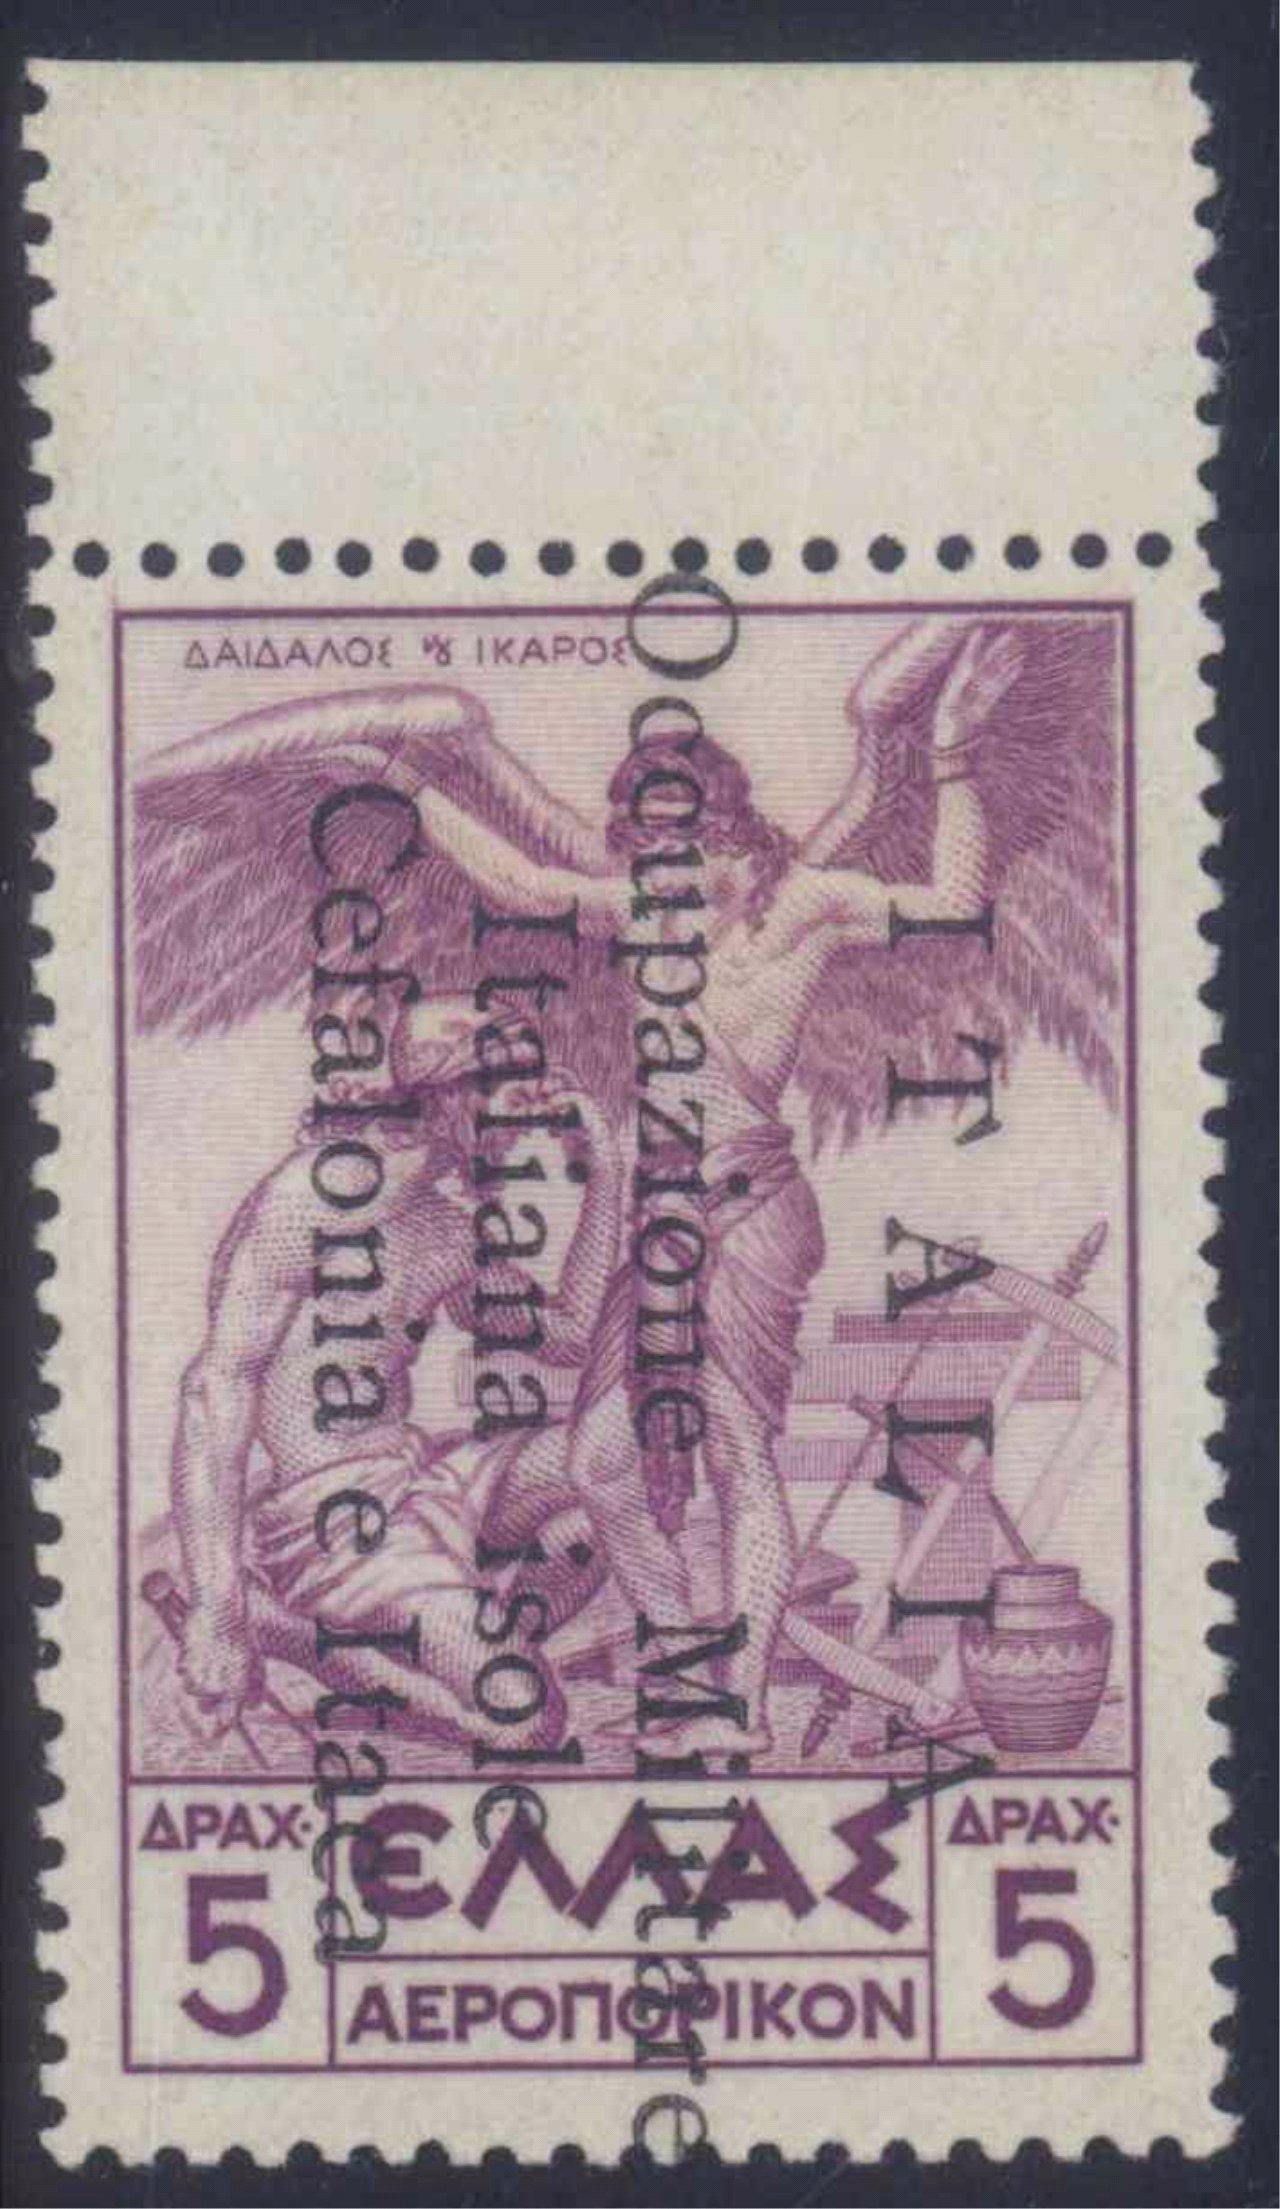 IONISCHE INSELN – Kefalonia und Ithaka, FLUGPOST